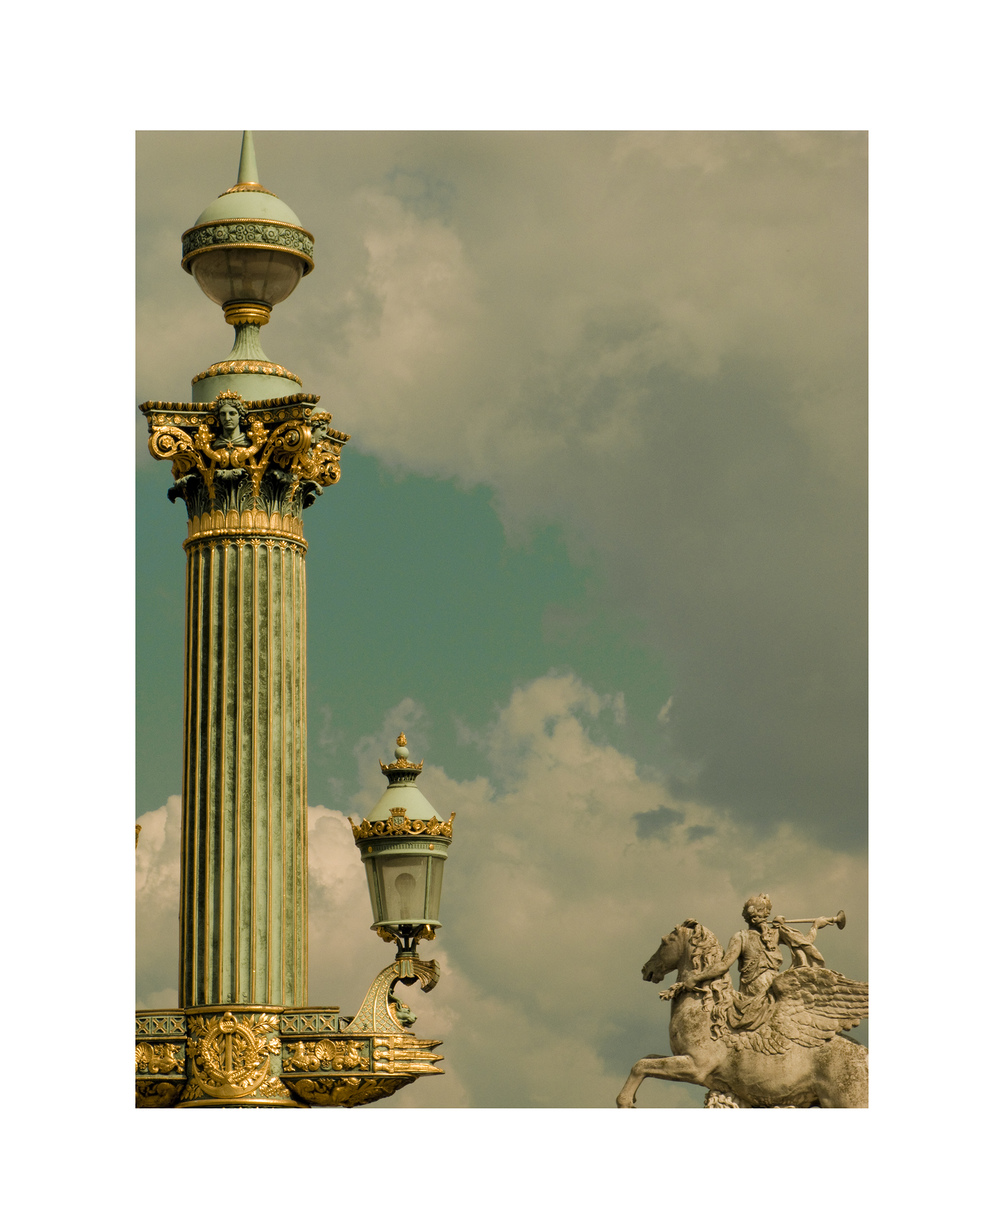 Paris IMG_1364.jpg